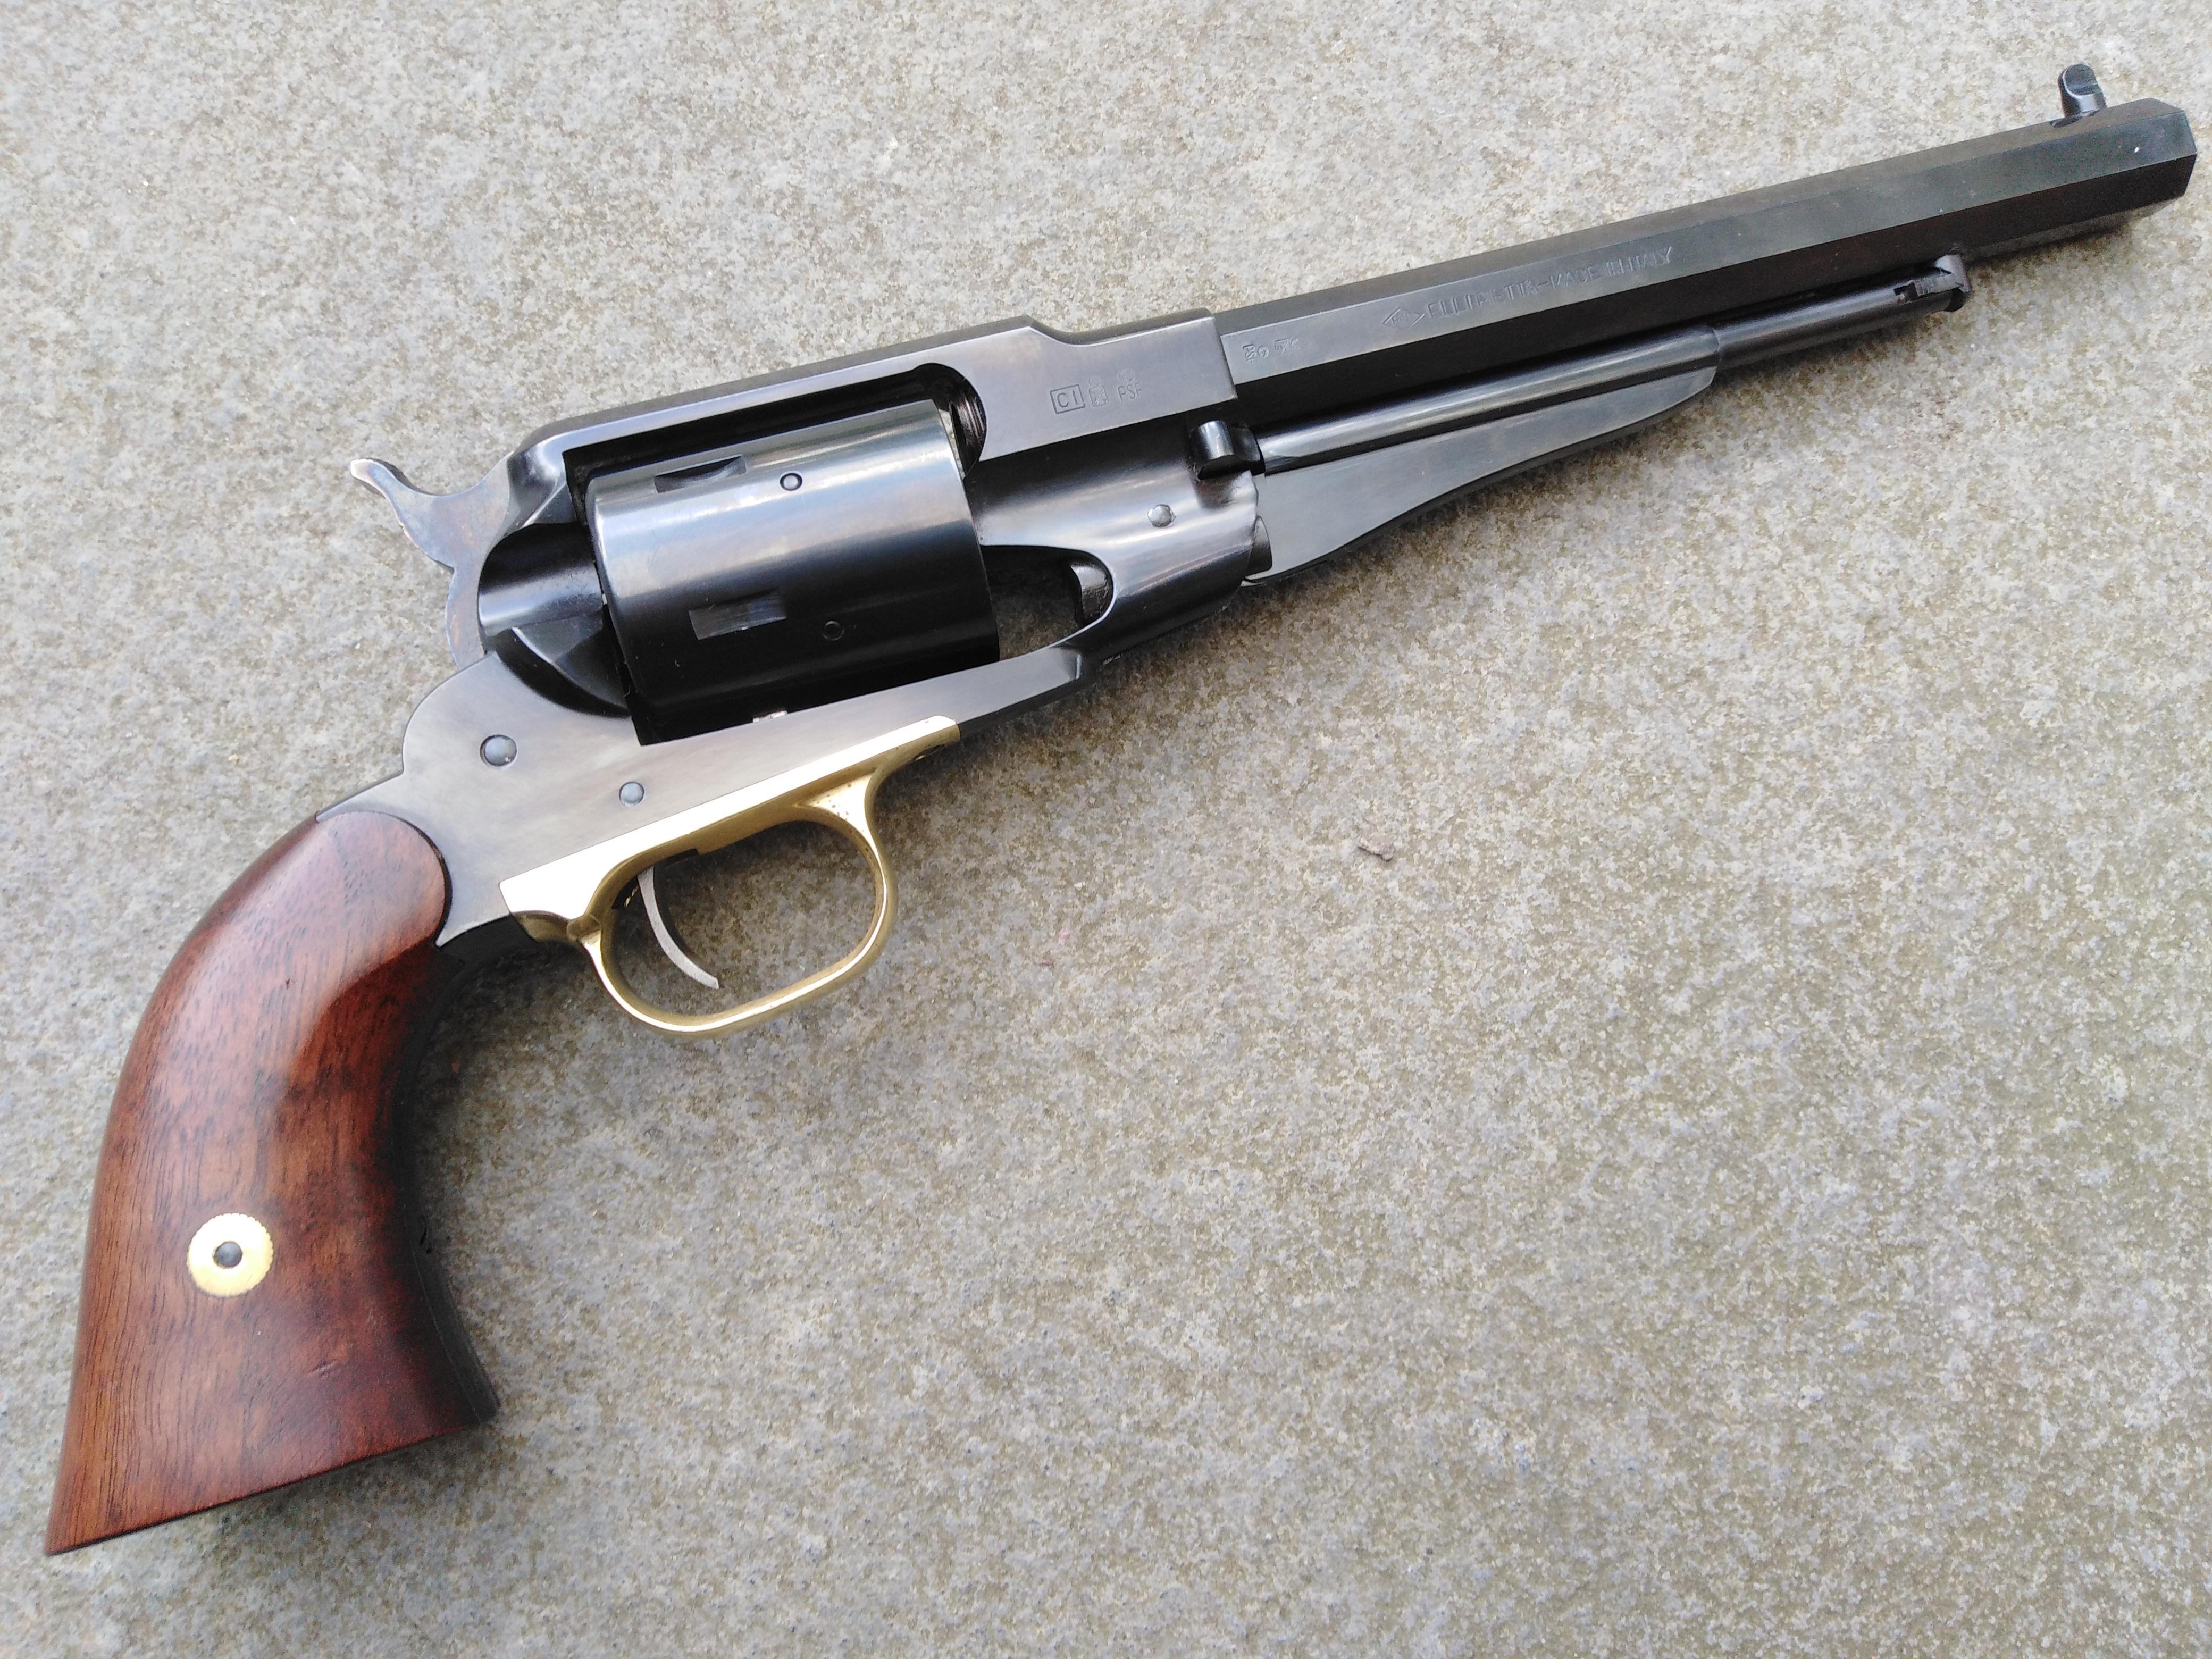 Pietta Steel Framed remington 1858 Army